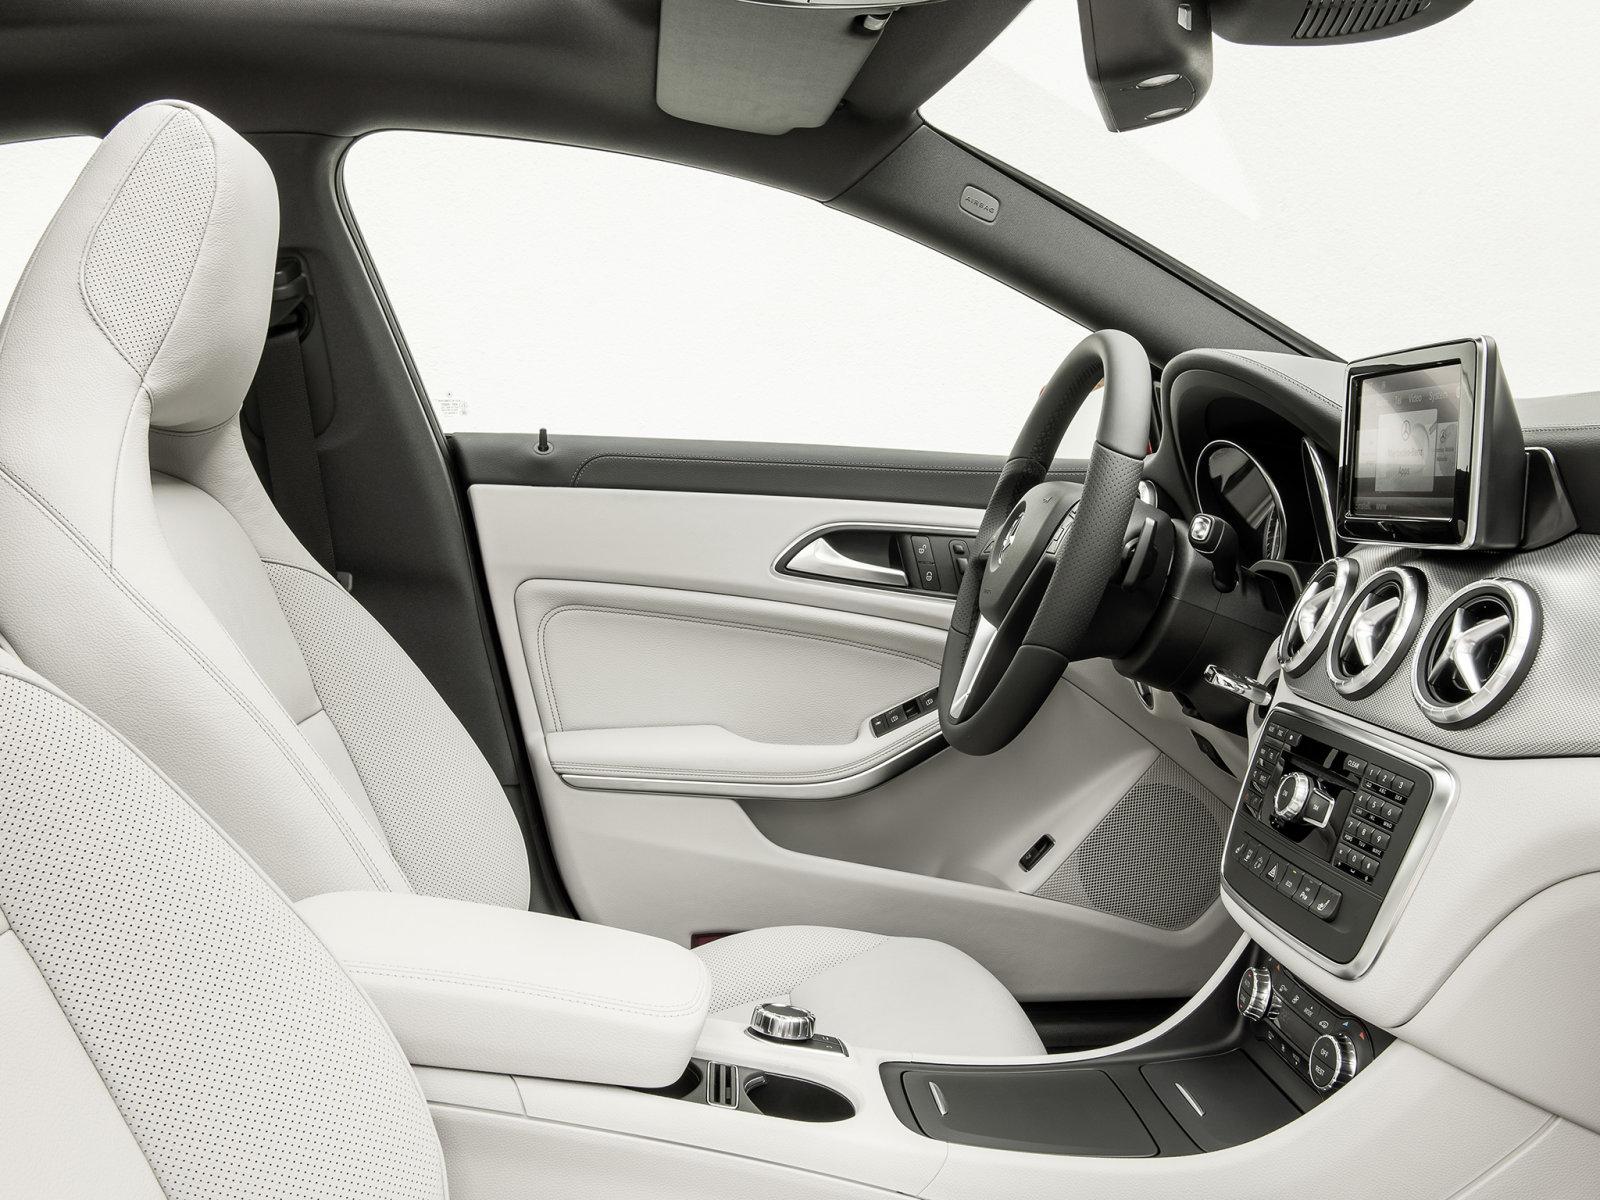 Mercedes-Benz (Мерседес-Бенц) CLA 2013- г.